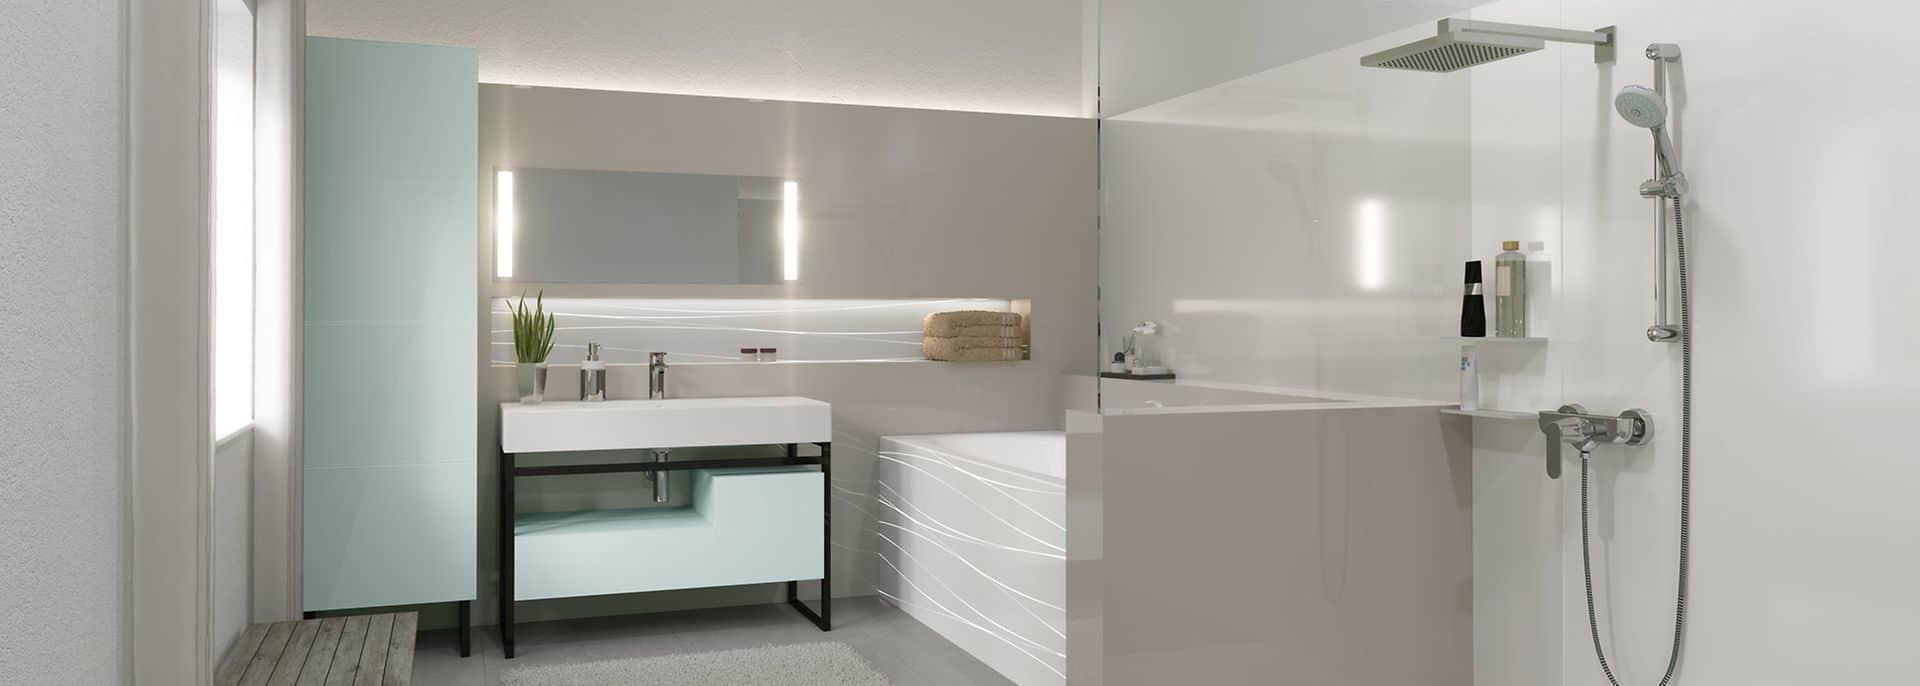 a beautiful bathroom in subtle neutral shades